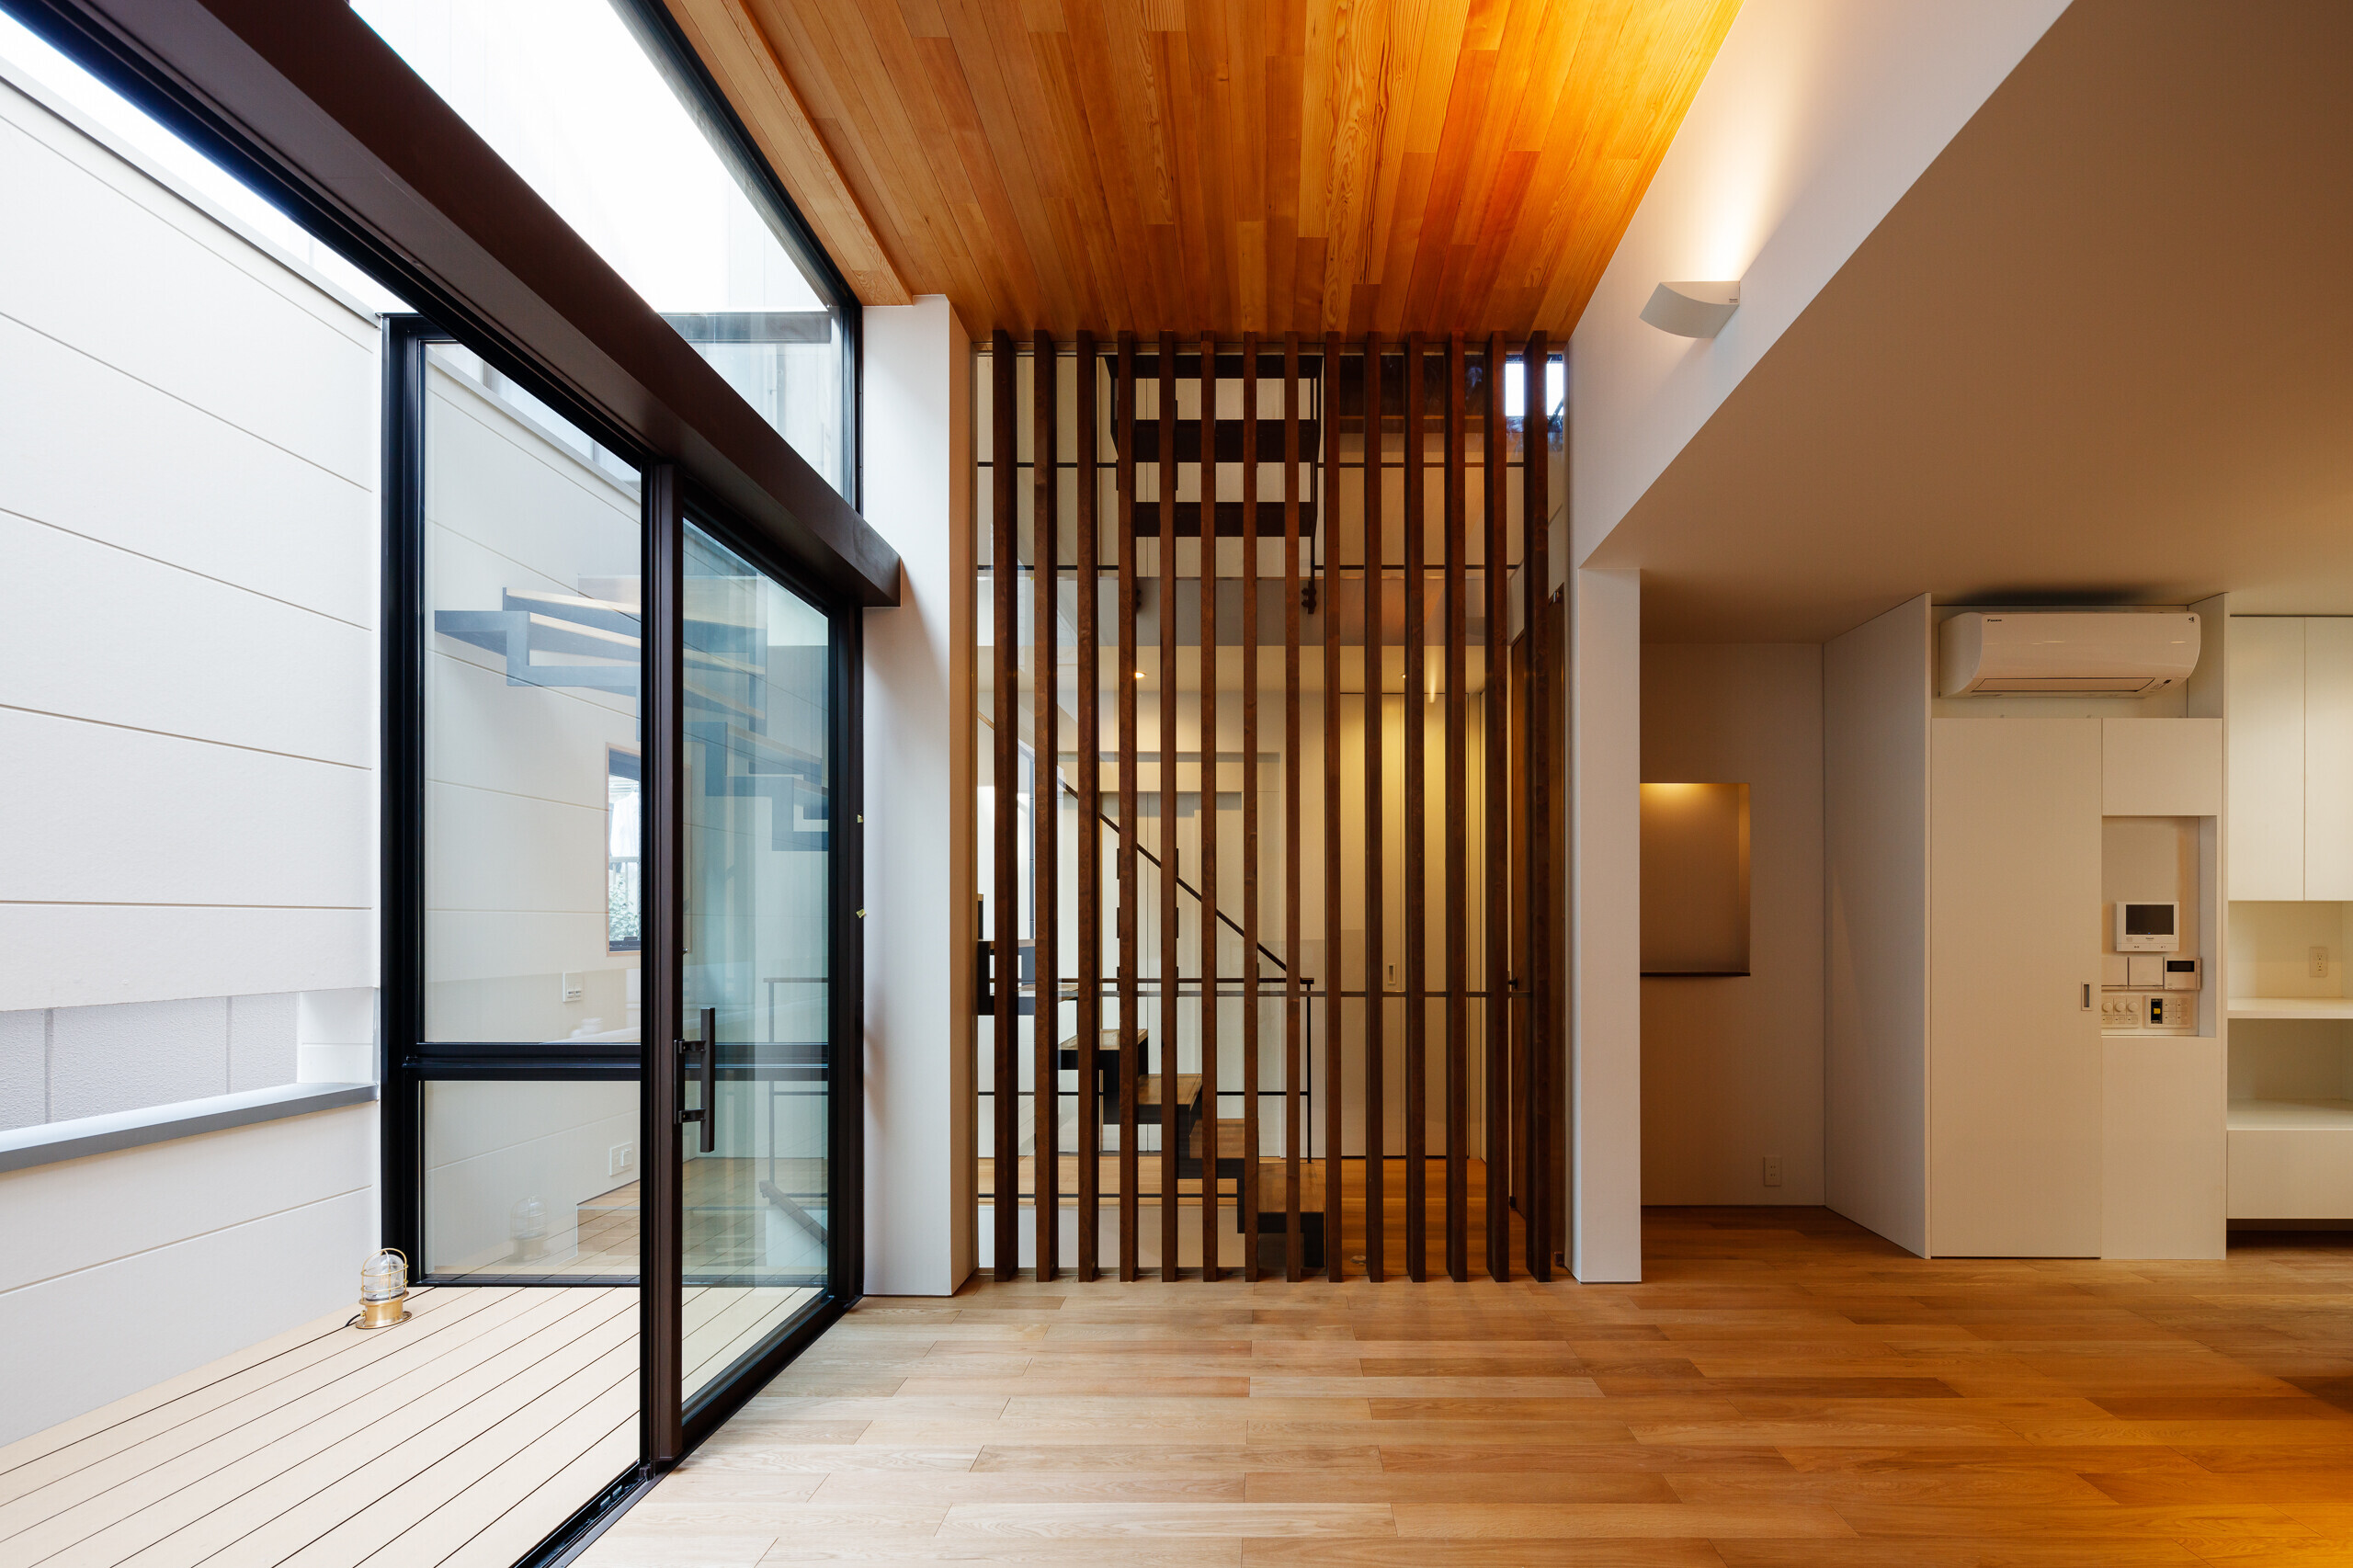 photo by大沢誠一 | 囲んだテラスに開いた2階リビングの家